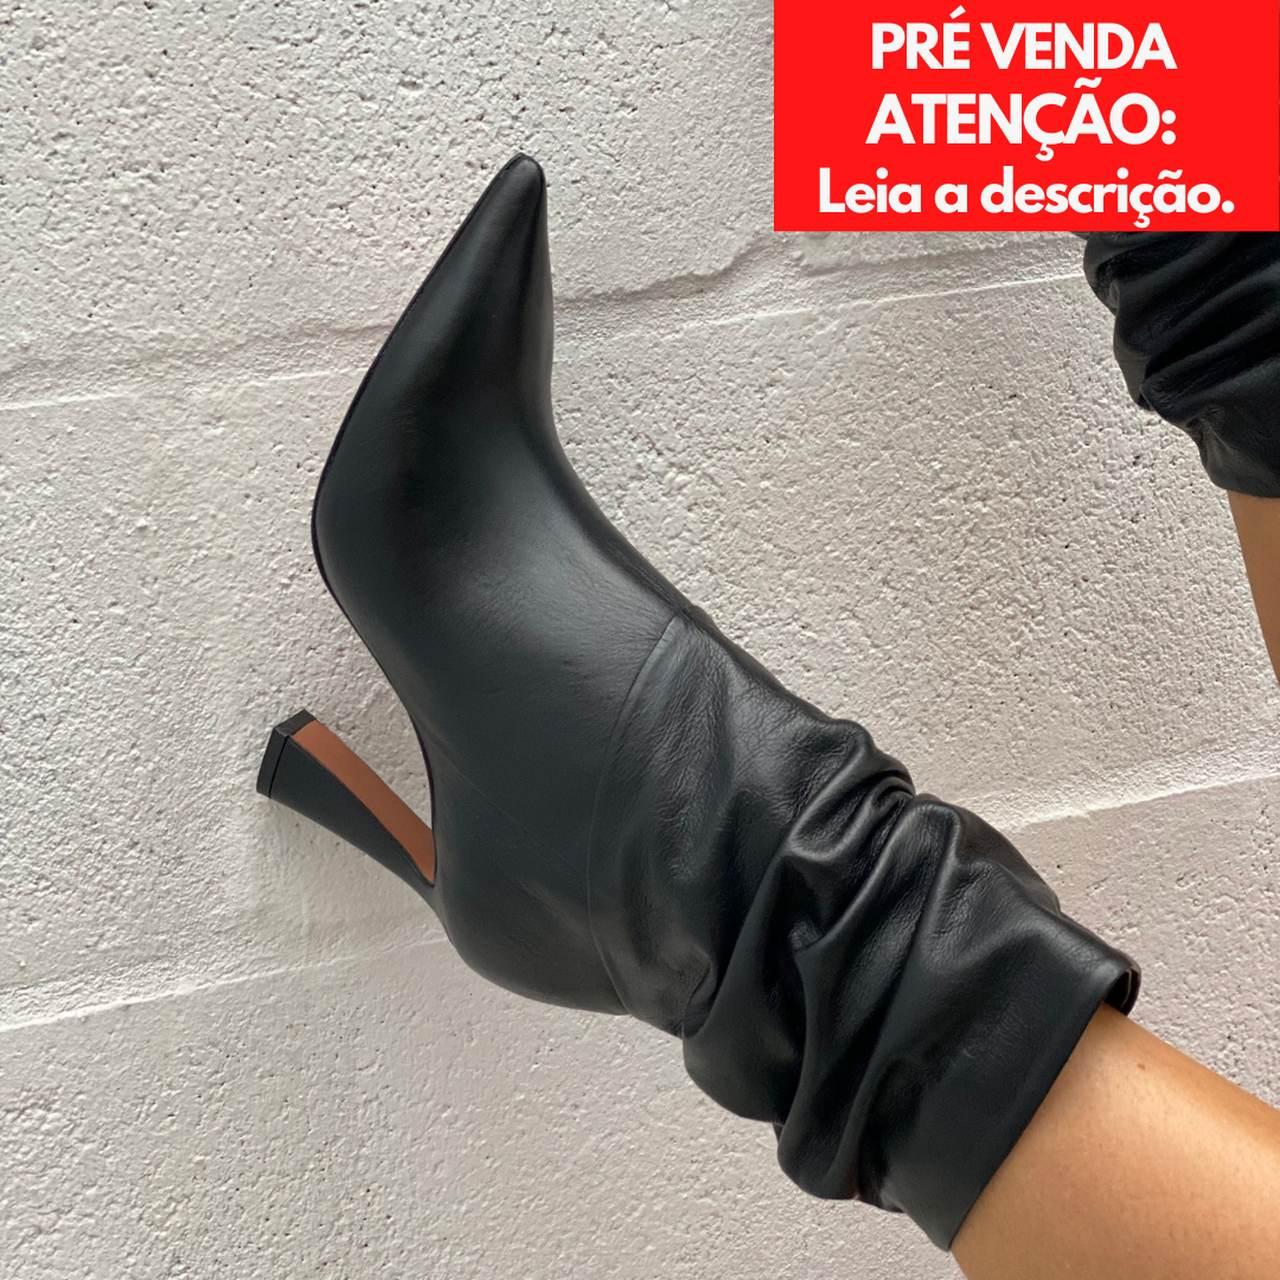 BOTA COURO SLOUCH PRETO VICENZA *** PRÉ VENDA *** DATA PREVISTA DE ENVIO 15/06